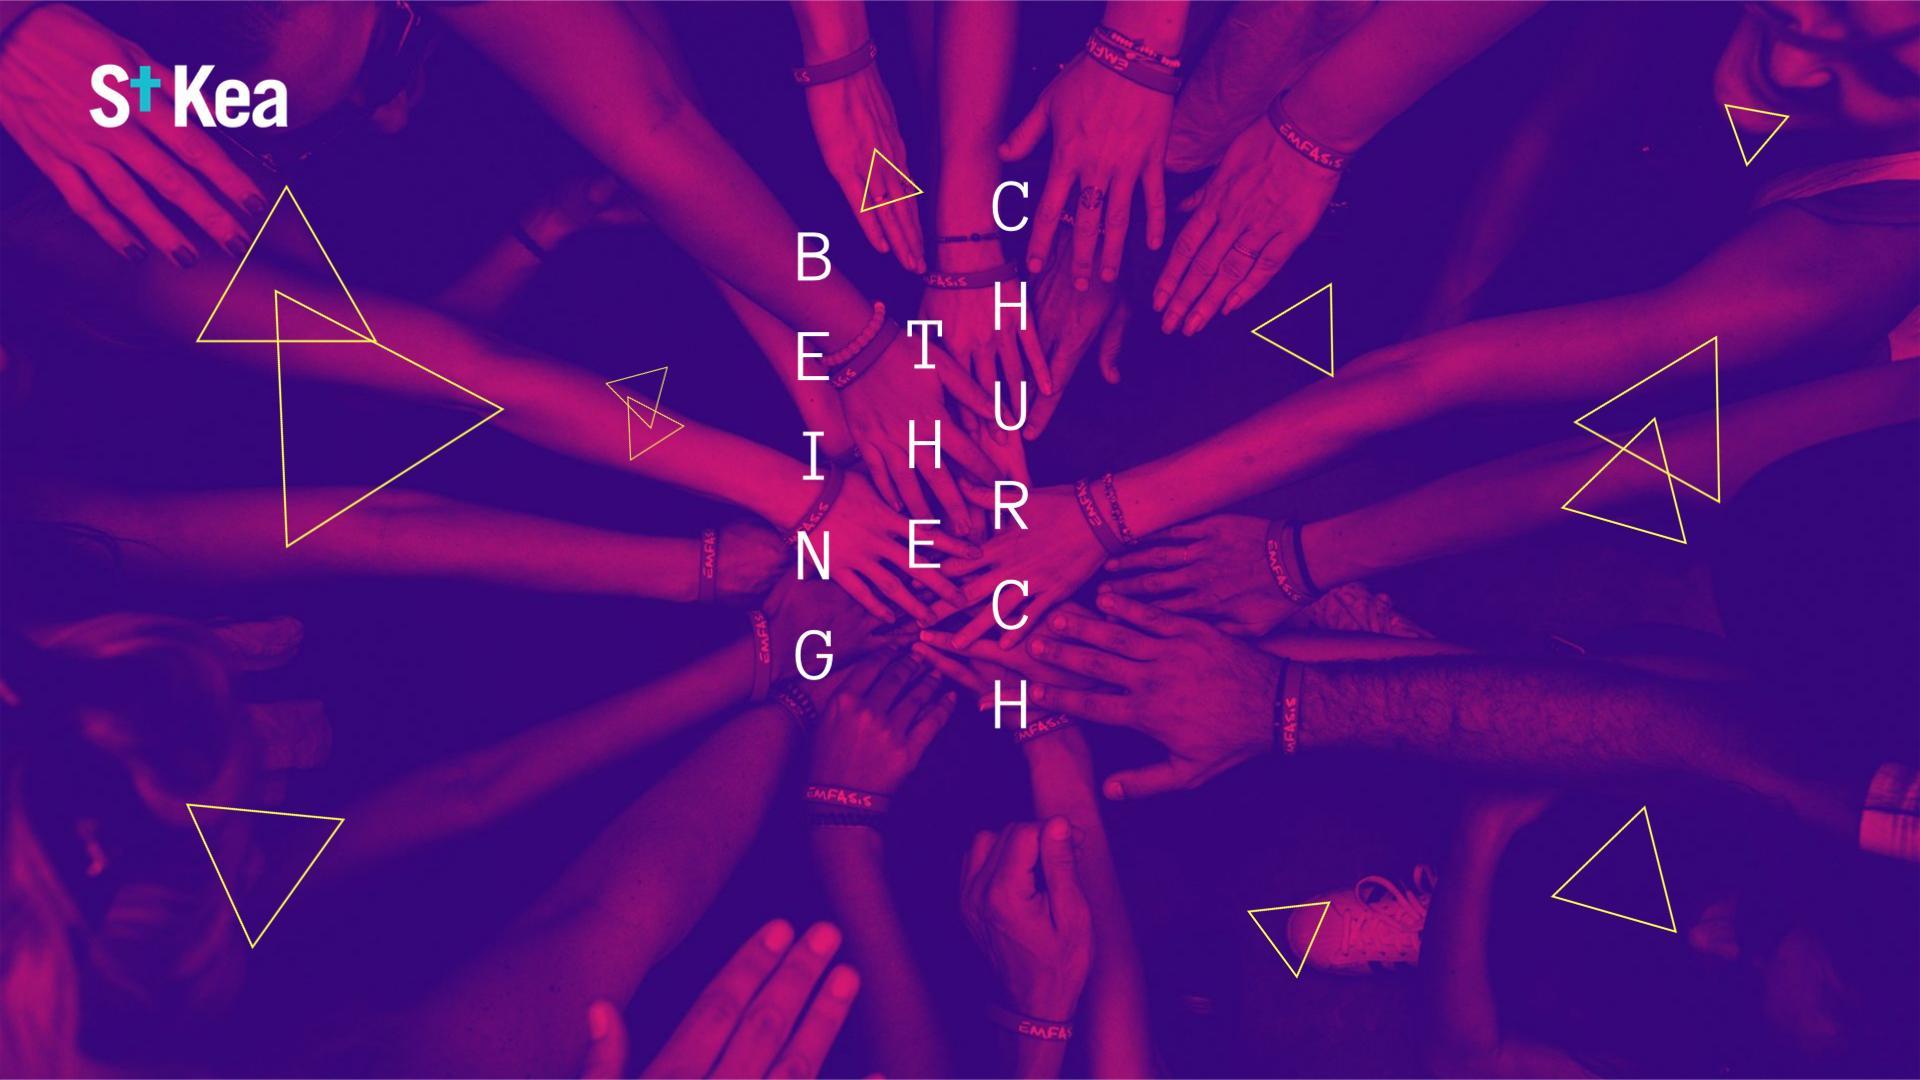 Being_the_Church_C_S_Logo.jpg